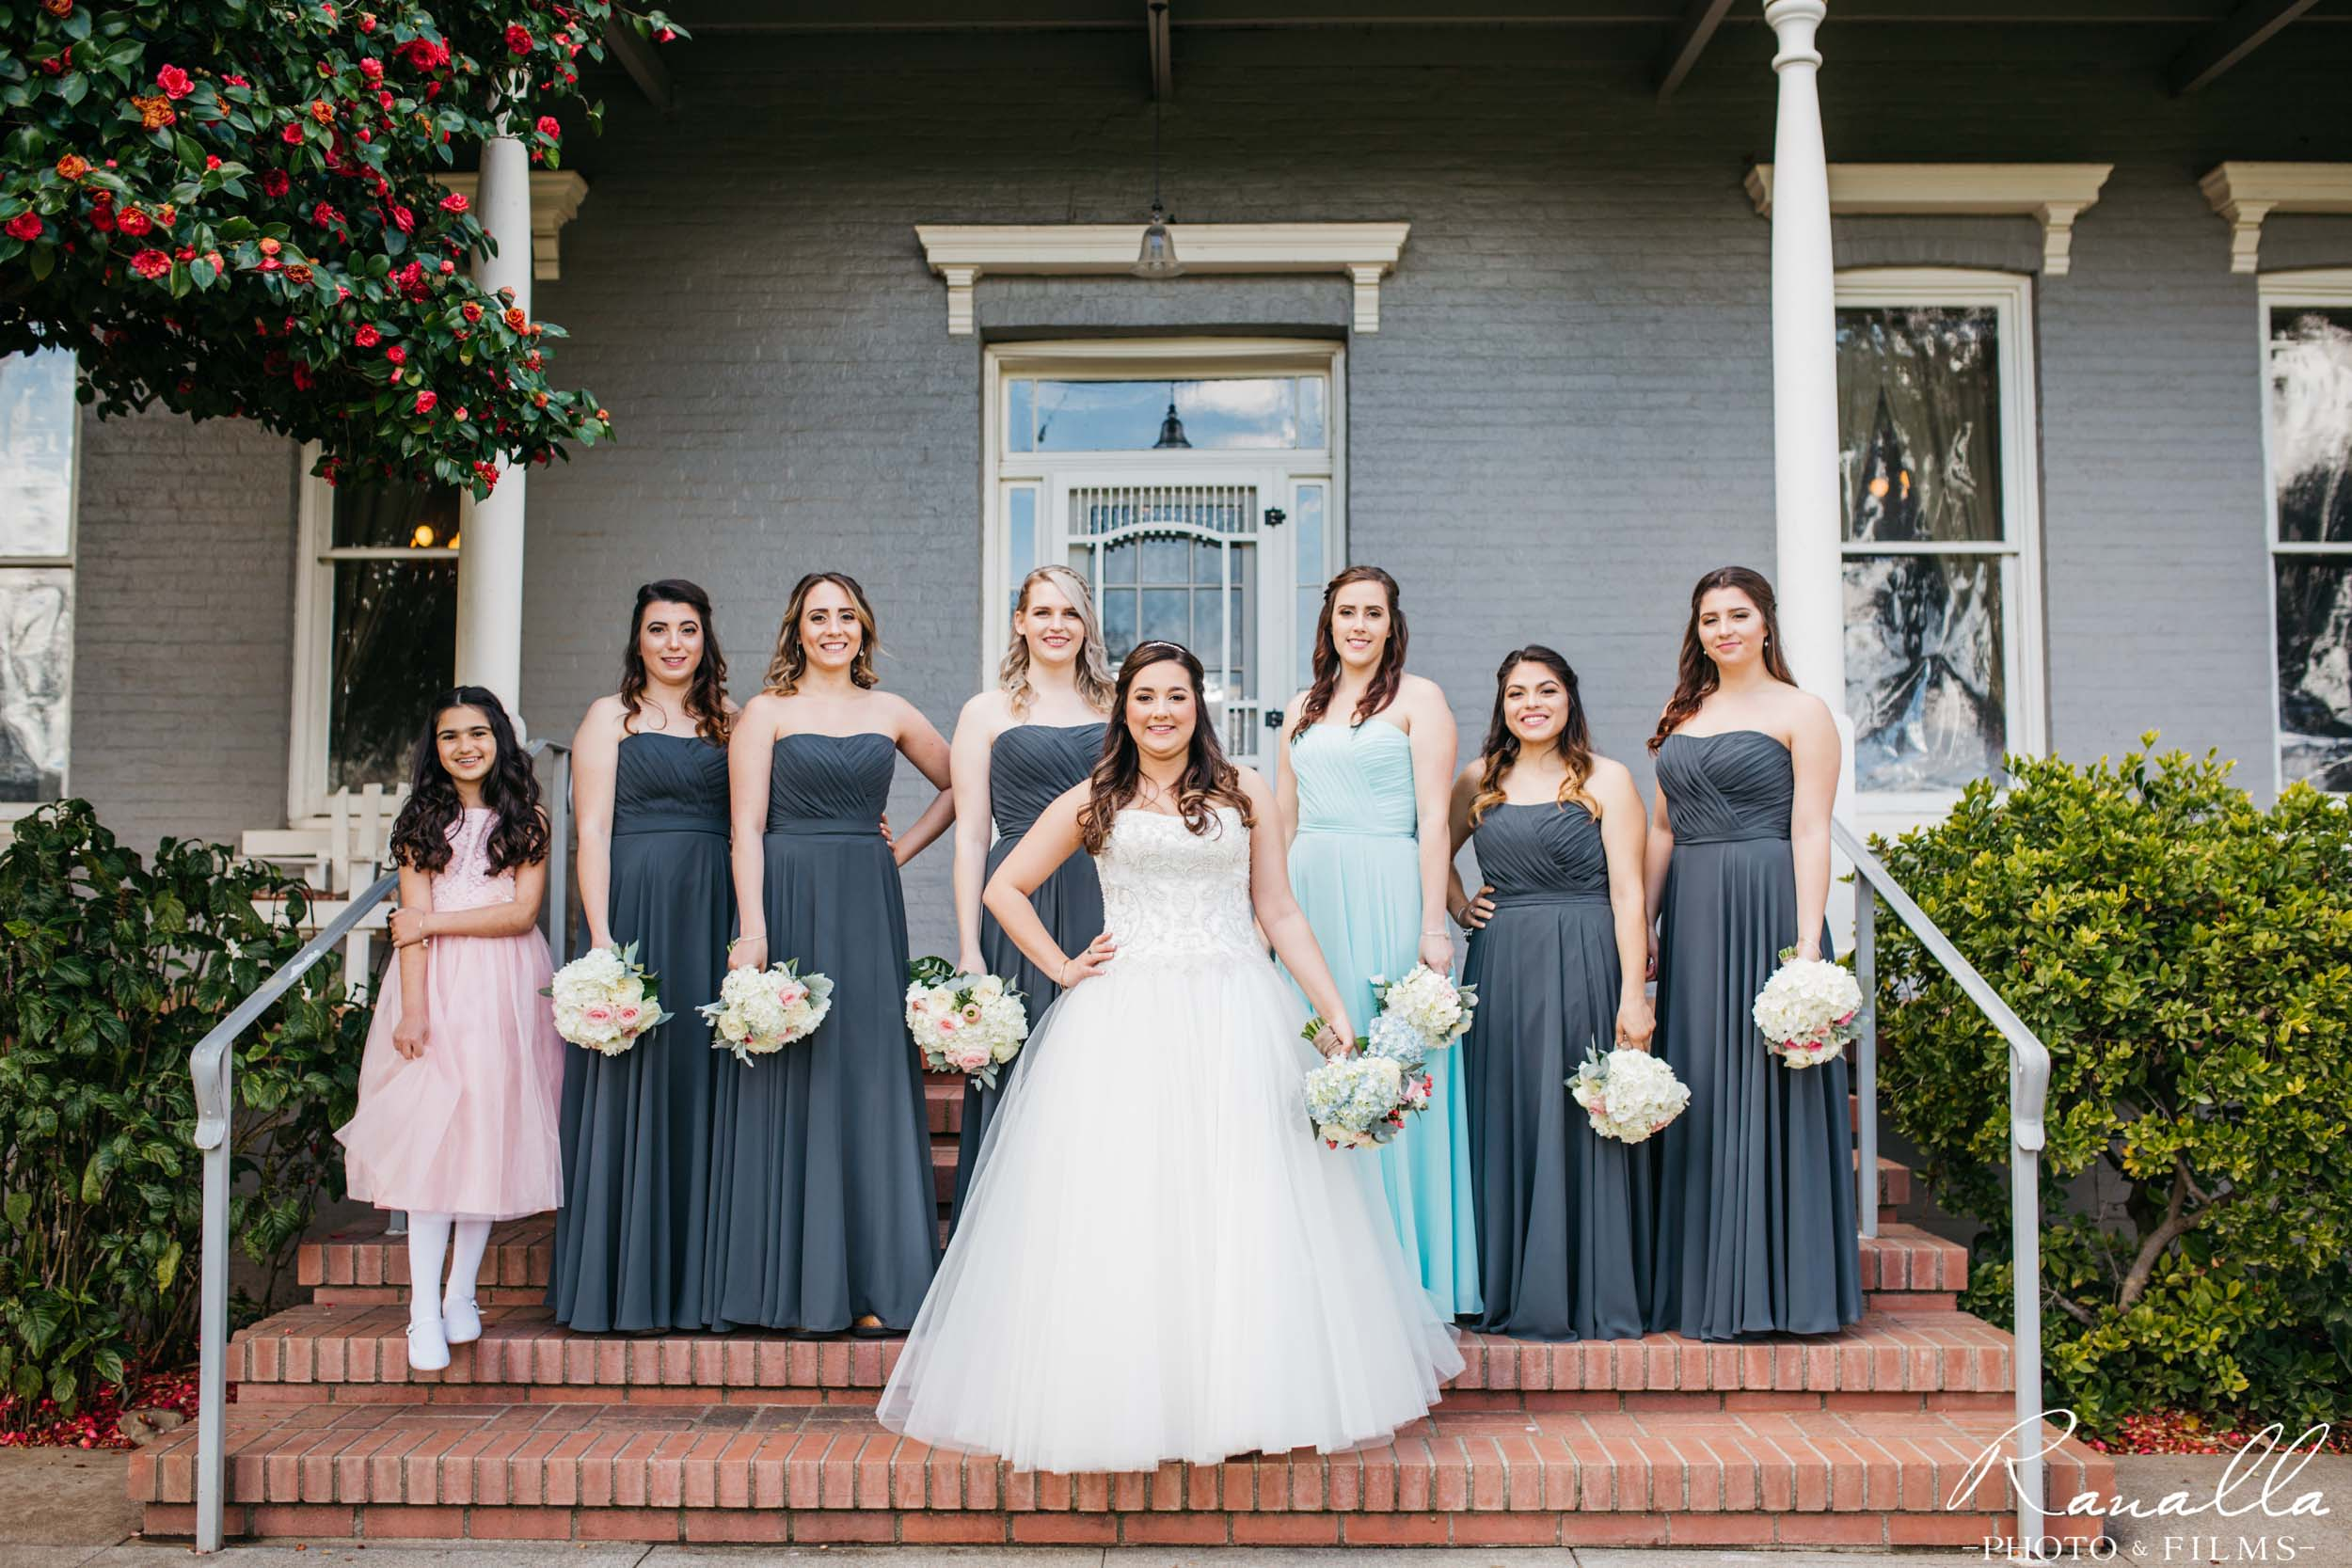 Chico Wedding Photography- Bridal Party on Porch- Patrick Ranch Wedding Photos- Ranalla Photo & Films